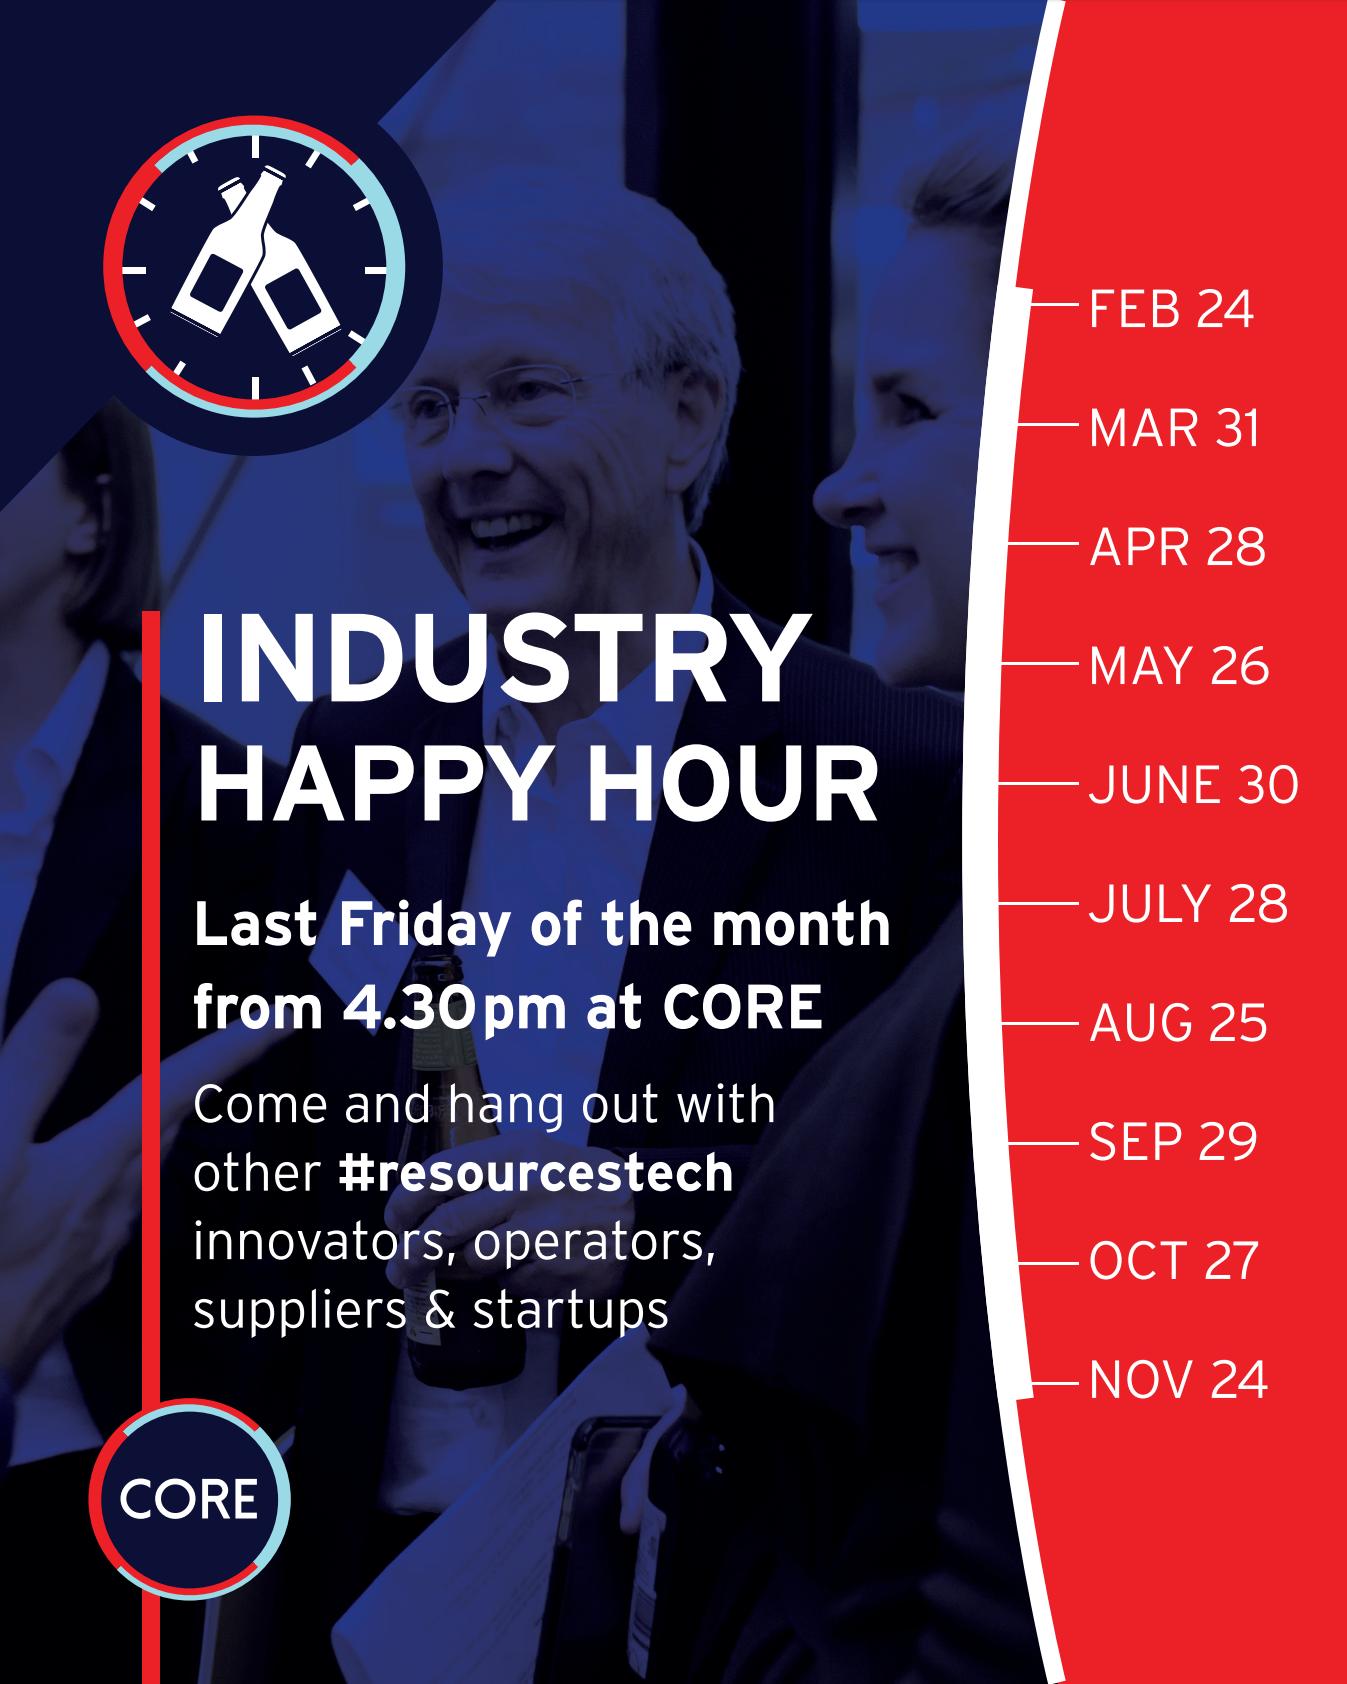 core-industry-happy-hour